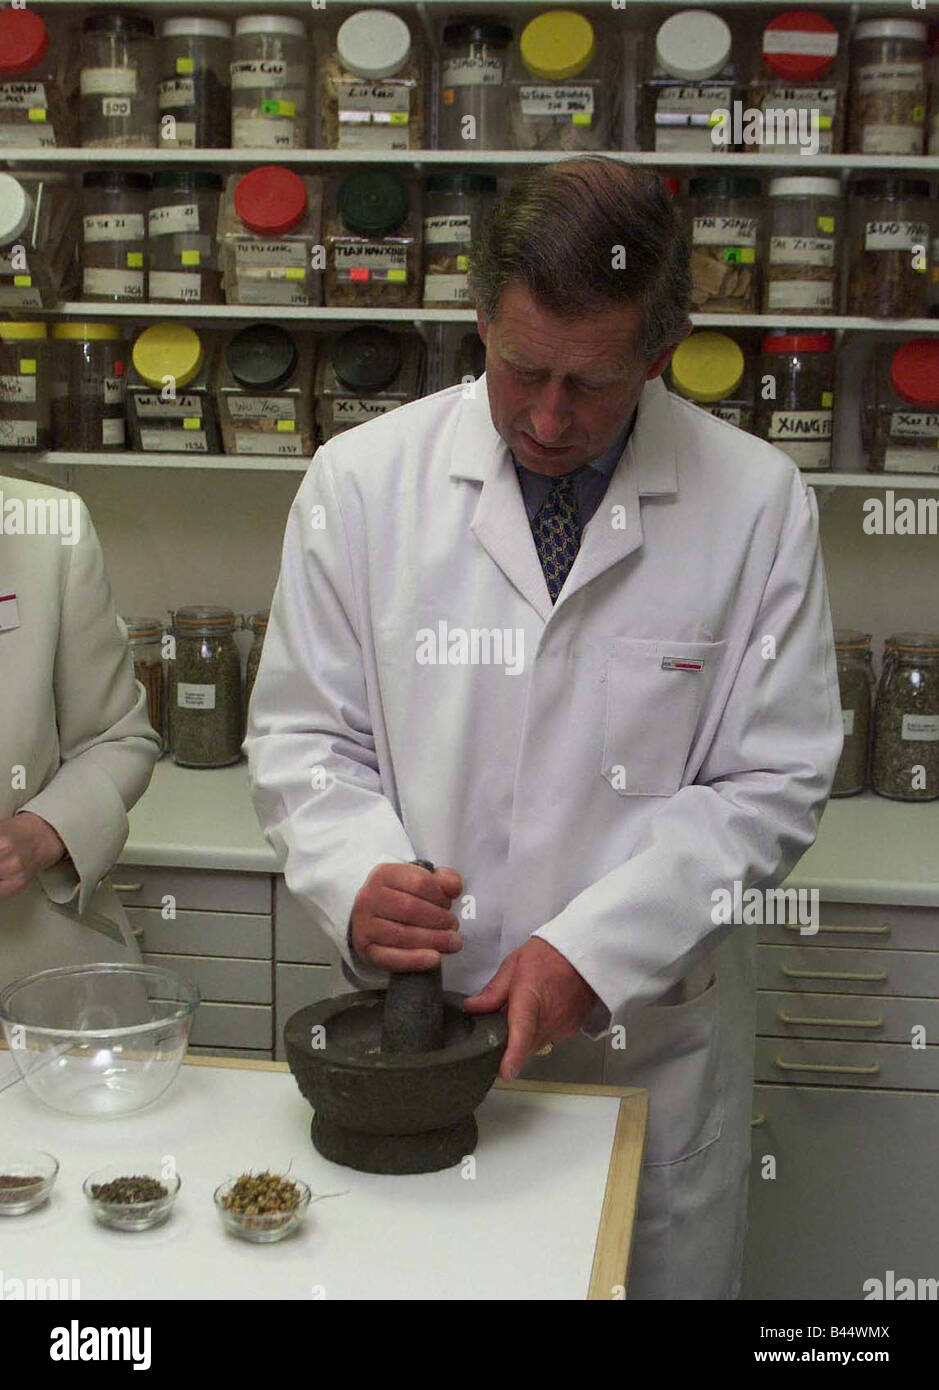 prince-charles-makes-herbal-medicine-at-